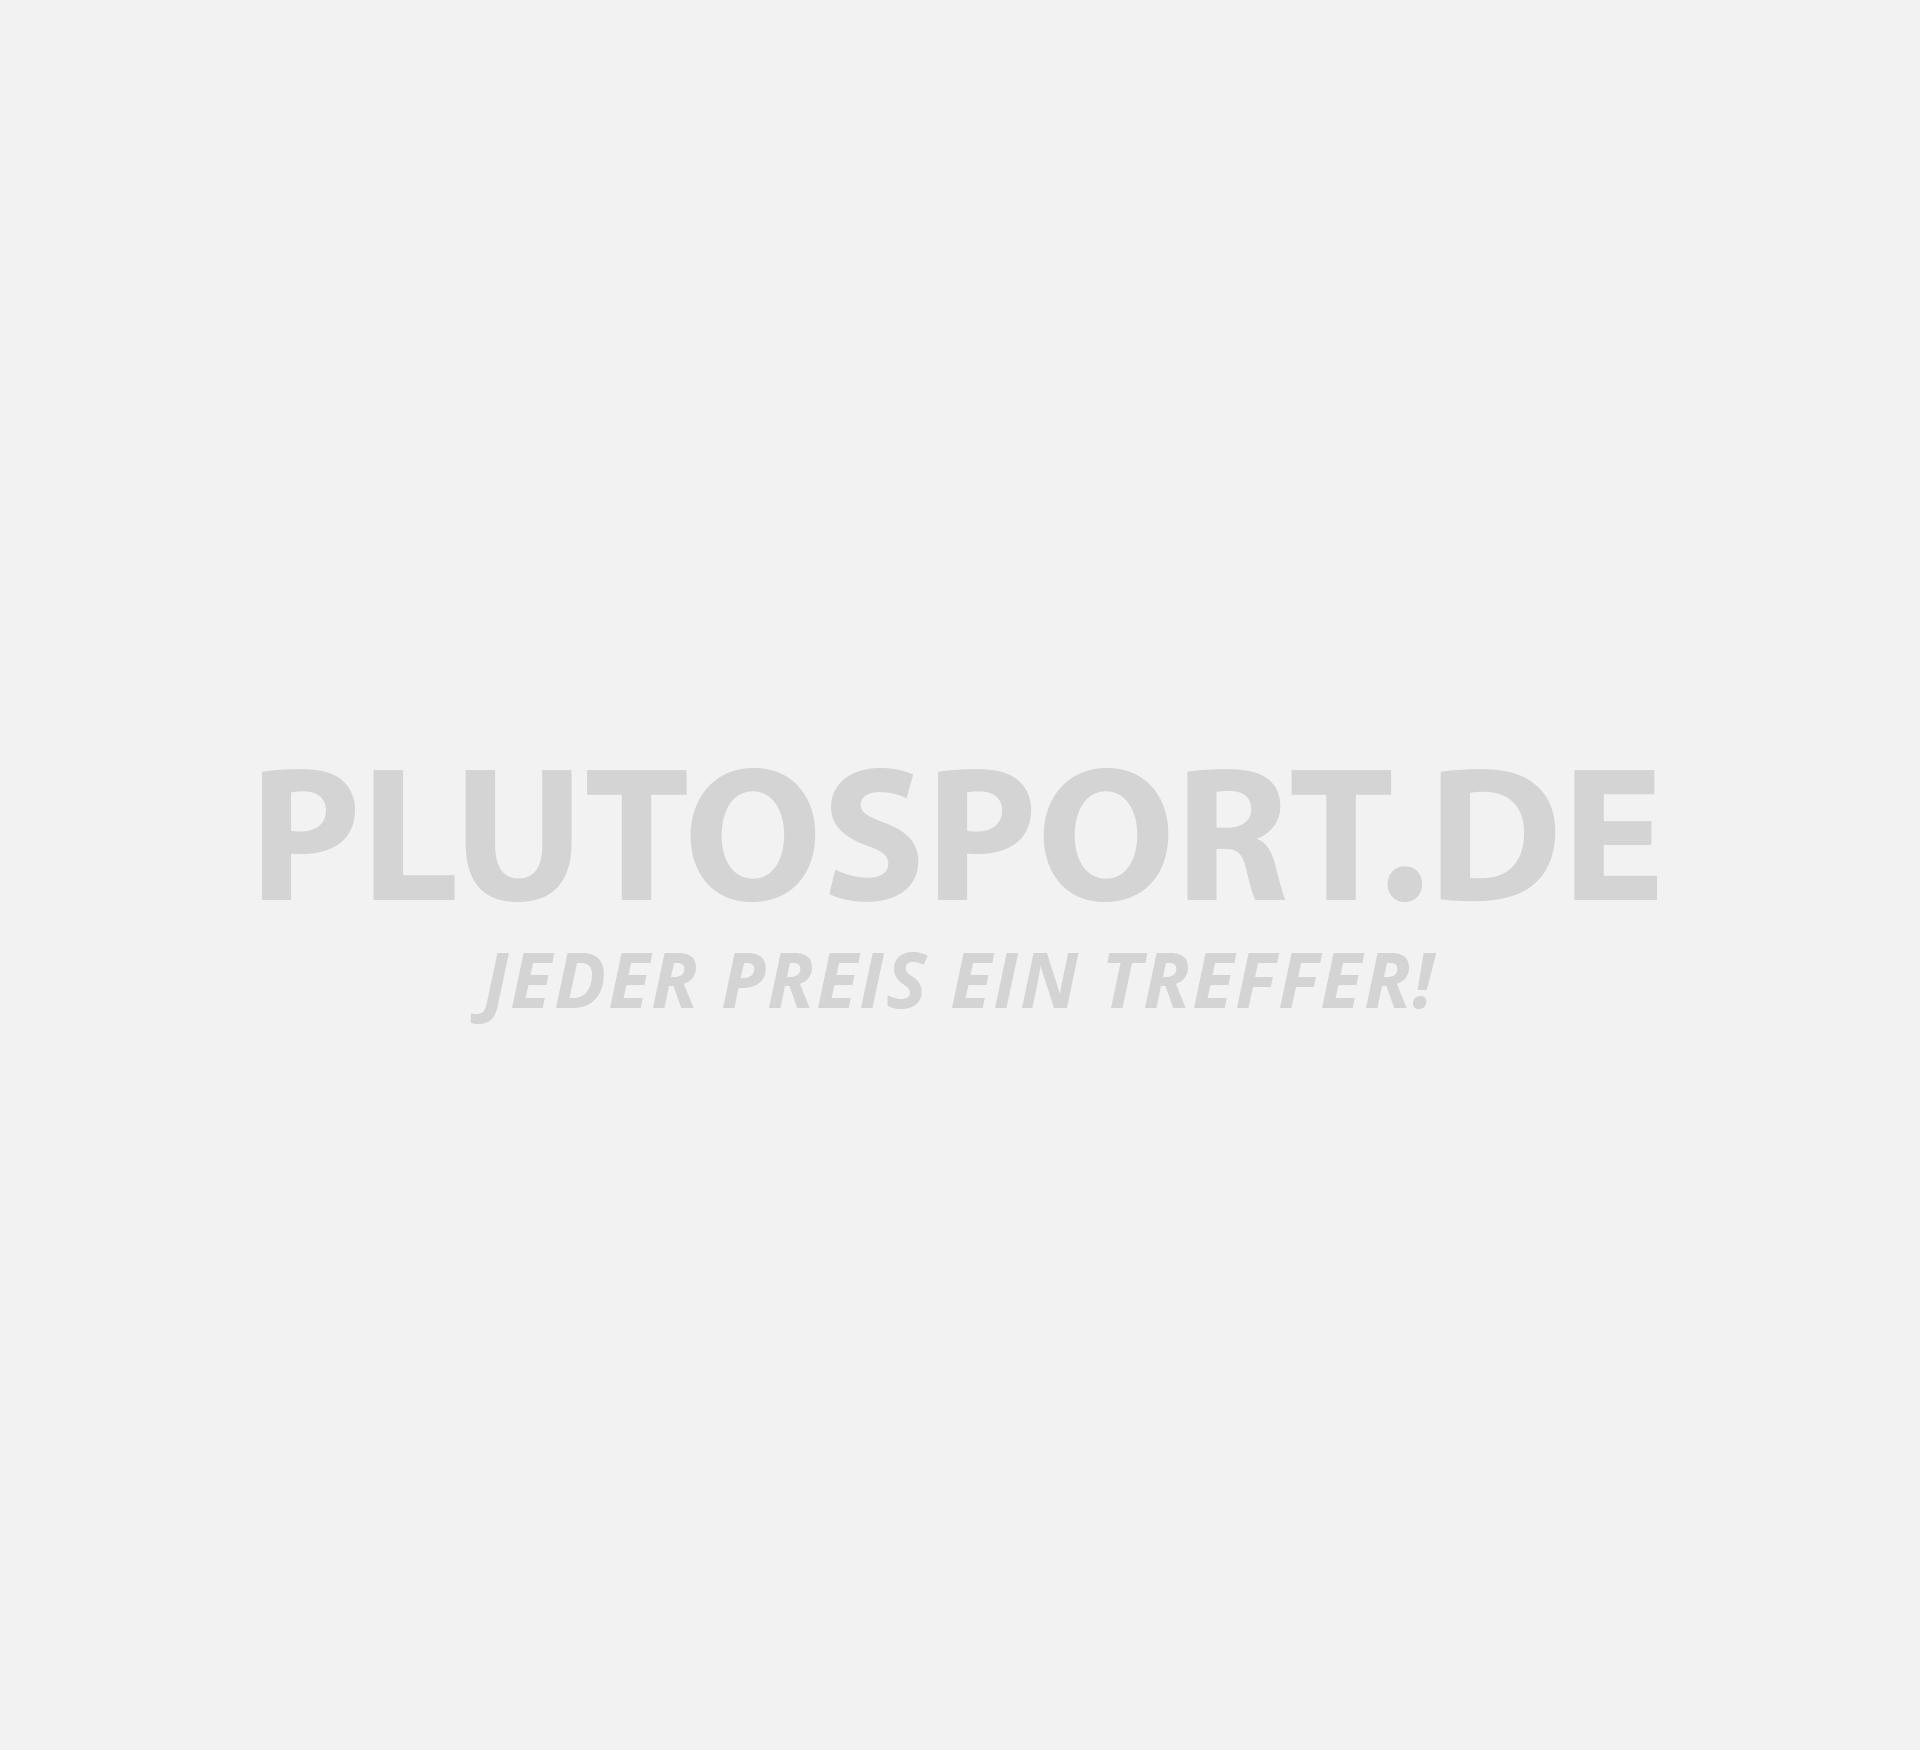 Castelli Promessa Jacquard Jersey FZ Radsportshirt Damen